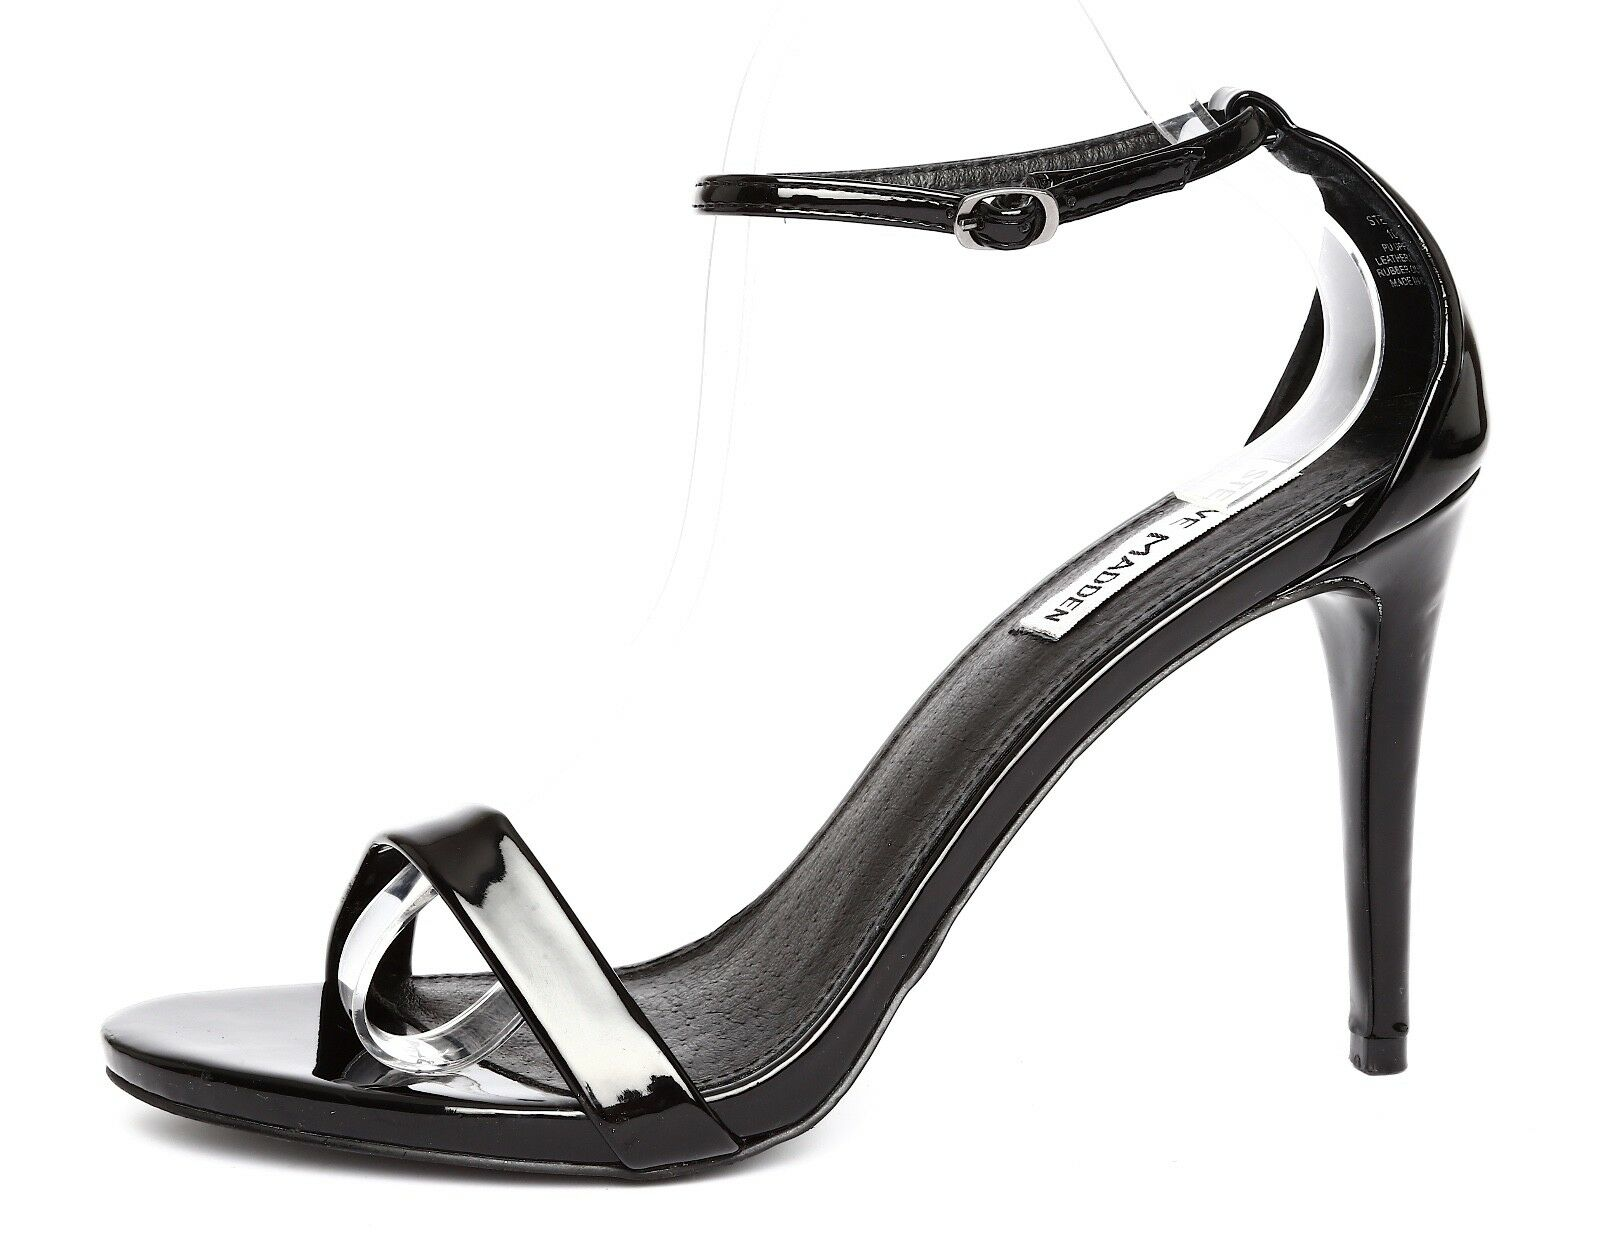 Steve Madden Stecy Patent Leather Black Ankle Strap Sandal Heels Sz 10M 7613